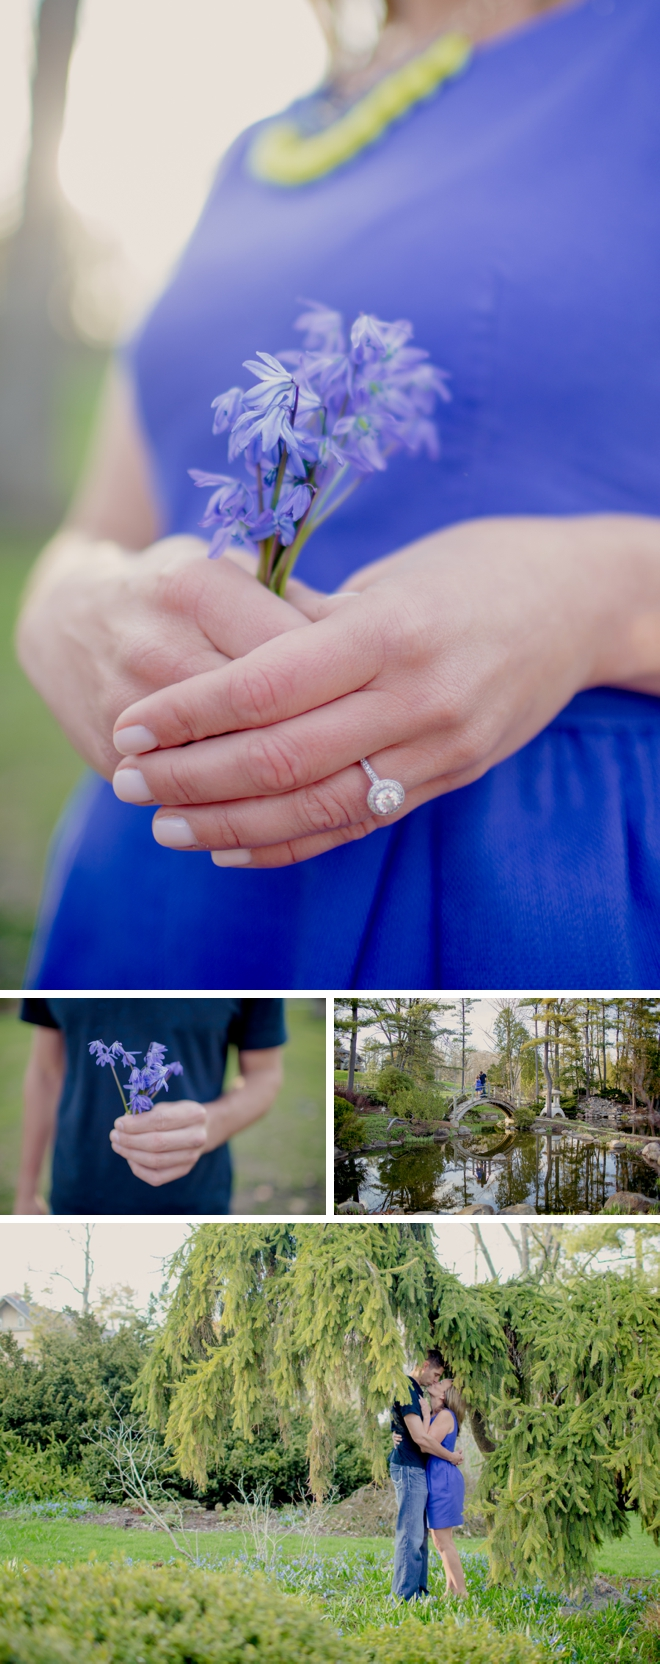 Fabyan Forest Preserve Engagement by Kristin La Voie Photography